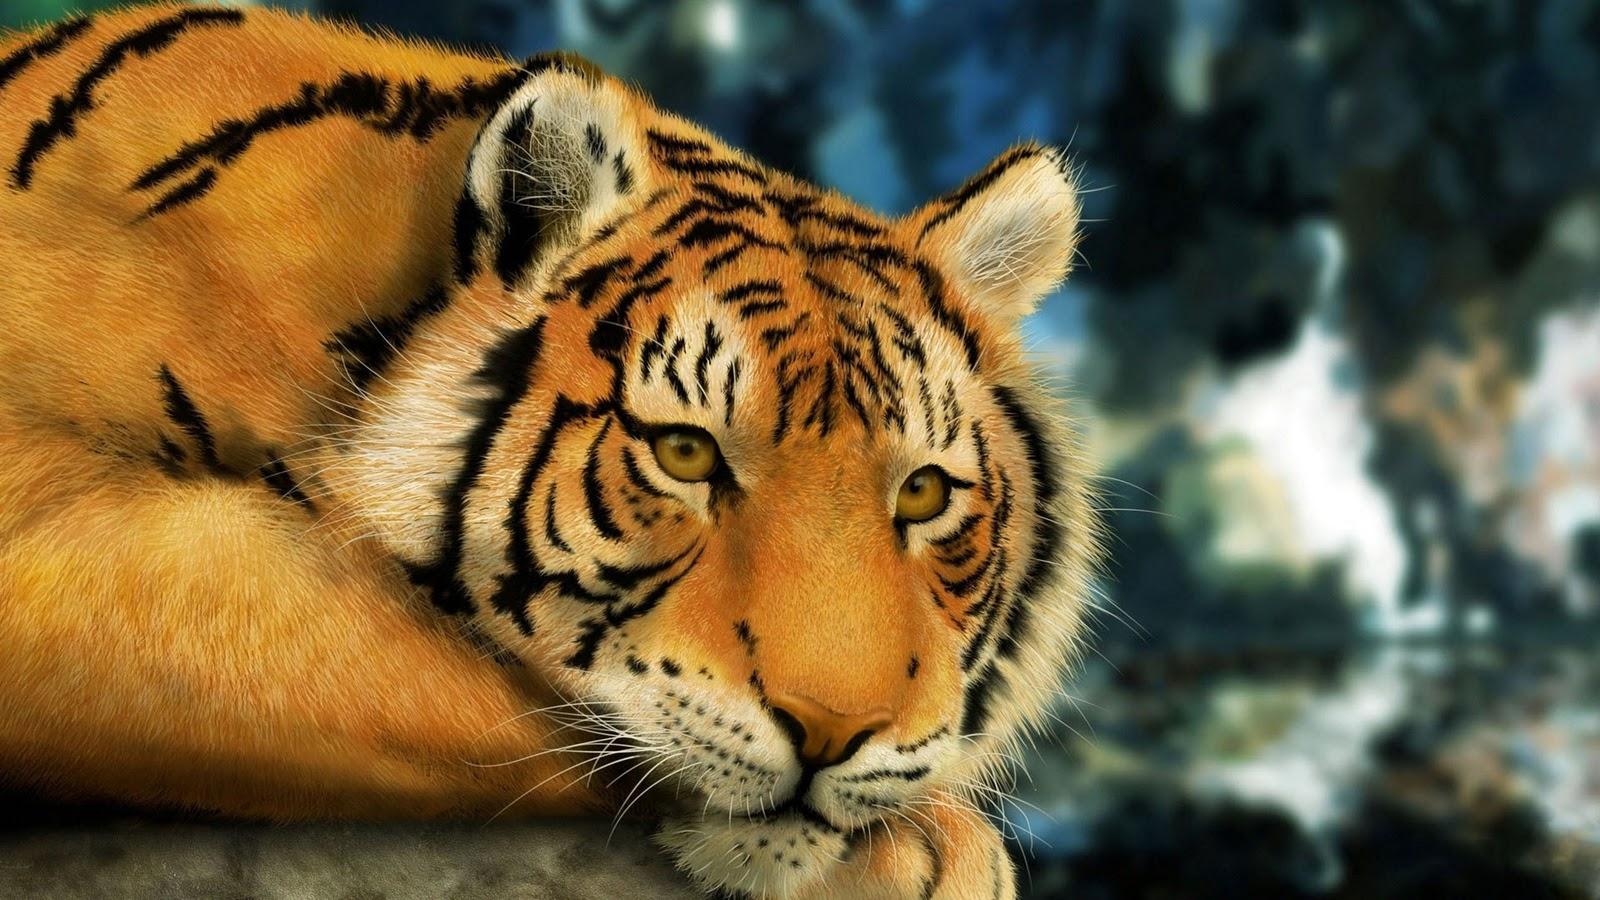 tiger 1920 x 1080 hd digital art tiger wallpaper 1080p 1600x900